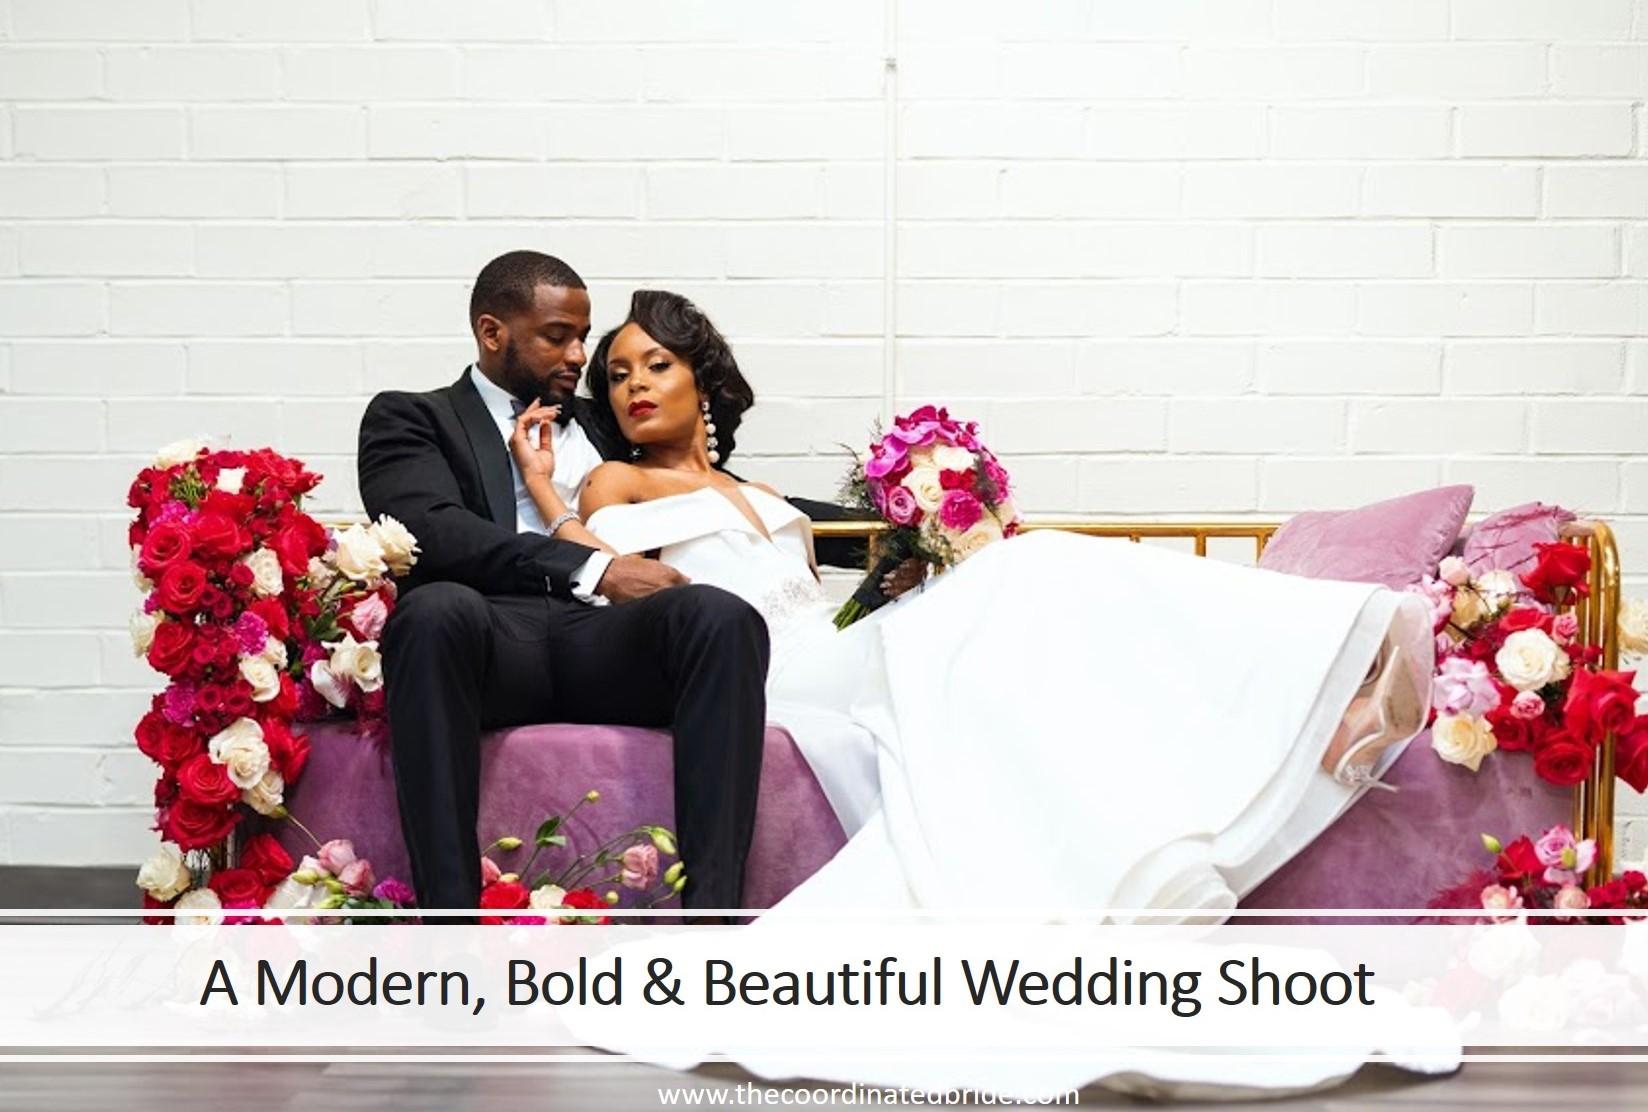 A Modern, Bold & Beautiful Wedding Shoot